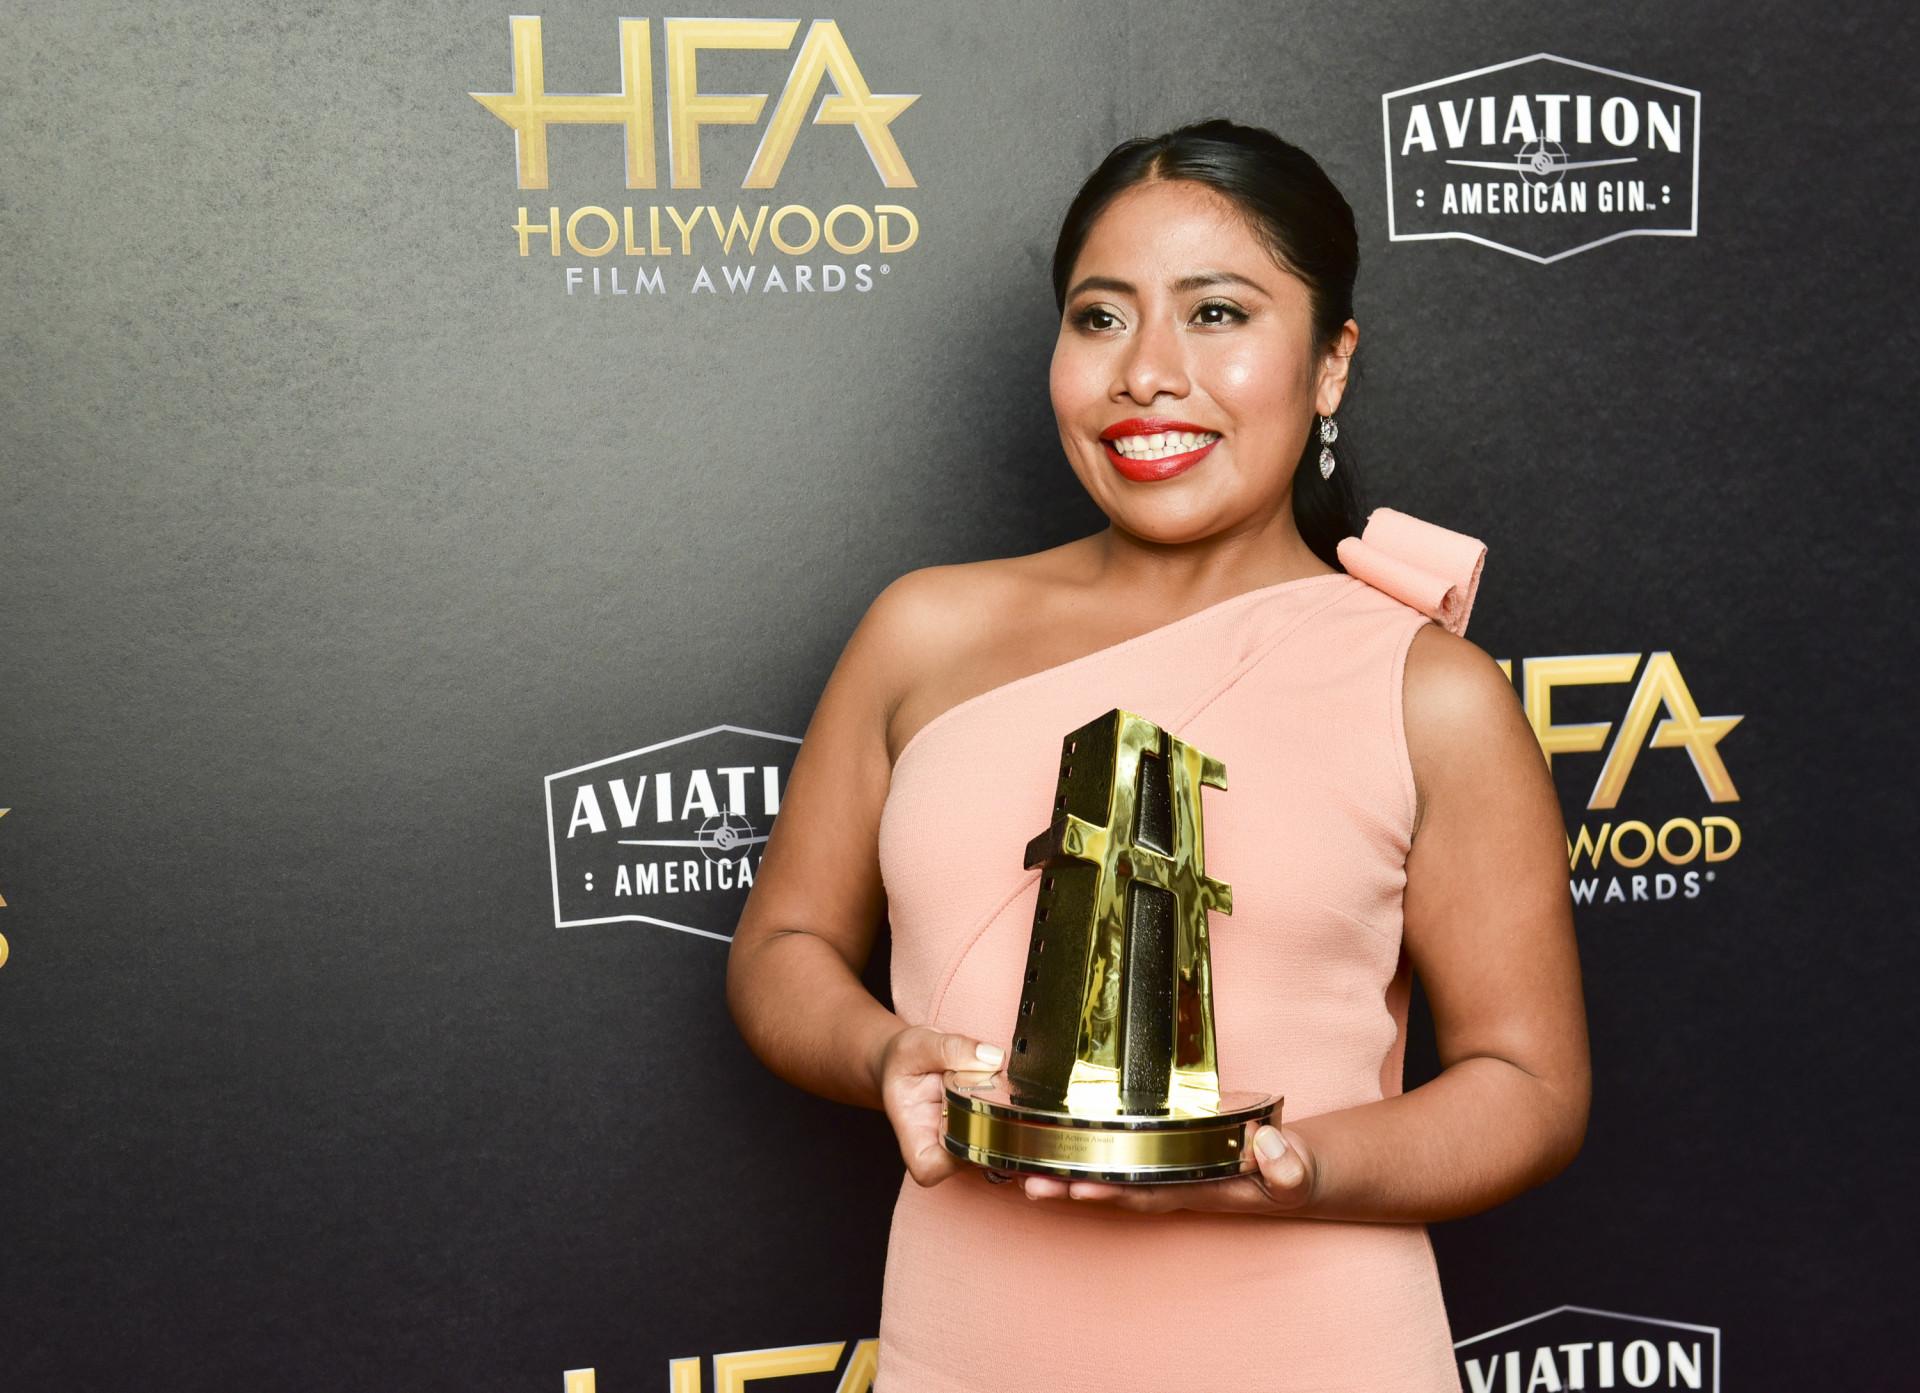 'Roma' wins three Oscars, including Best Director